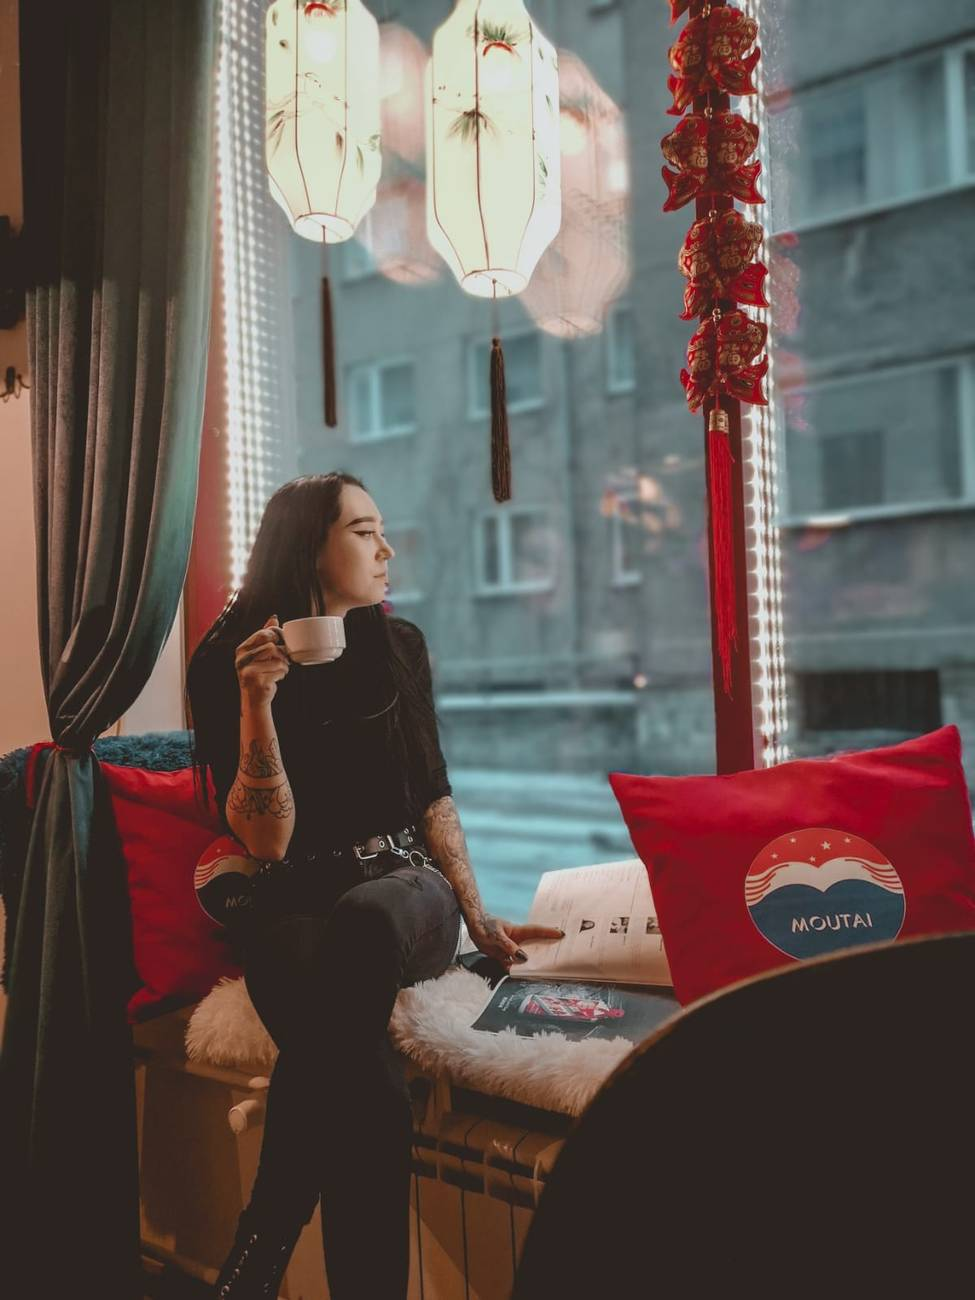 Girl enjoying a tea at the Moutai Bar in the Old Town of Tallinn, Estonia